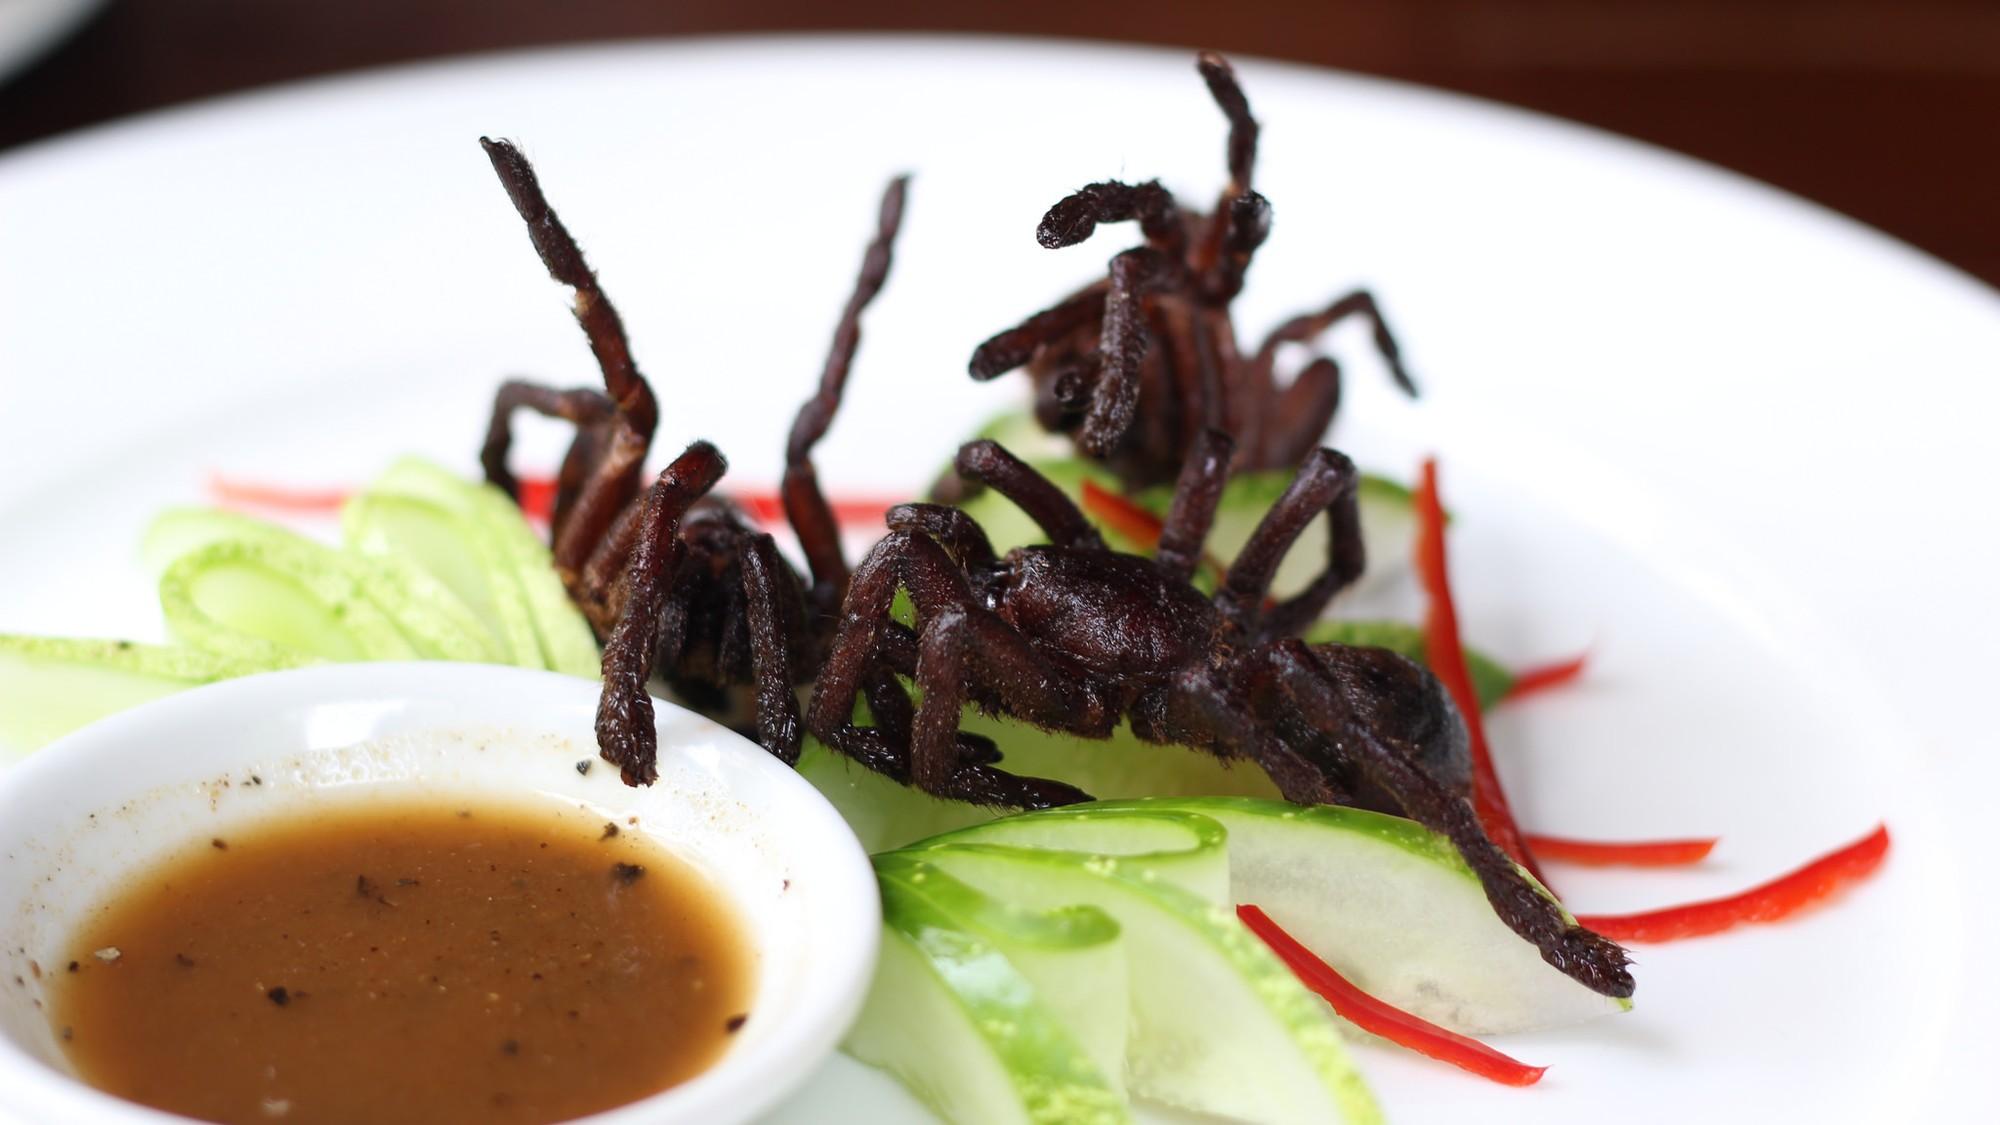 Image result for deep fried tarantula hd